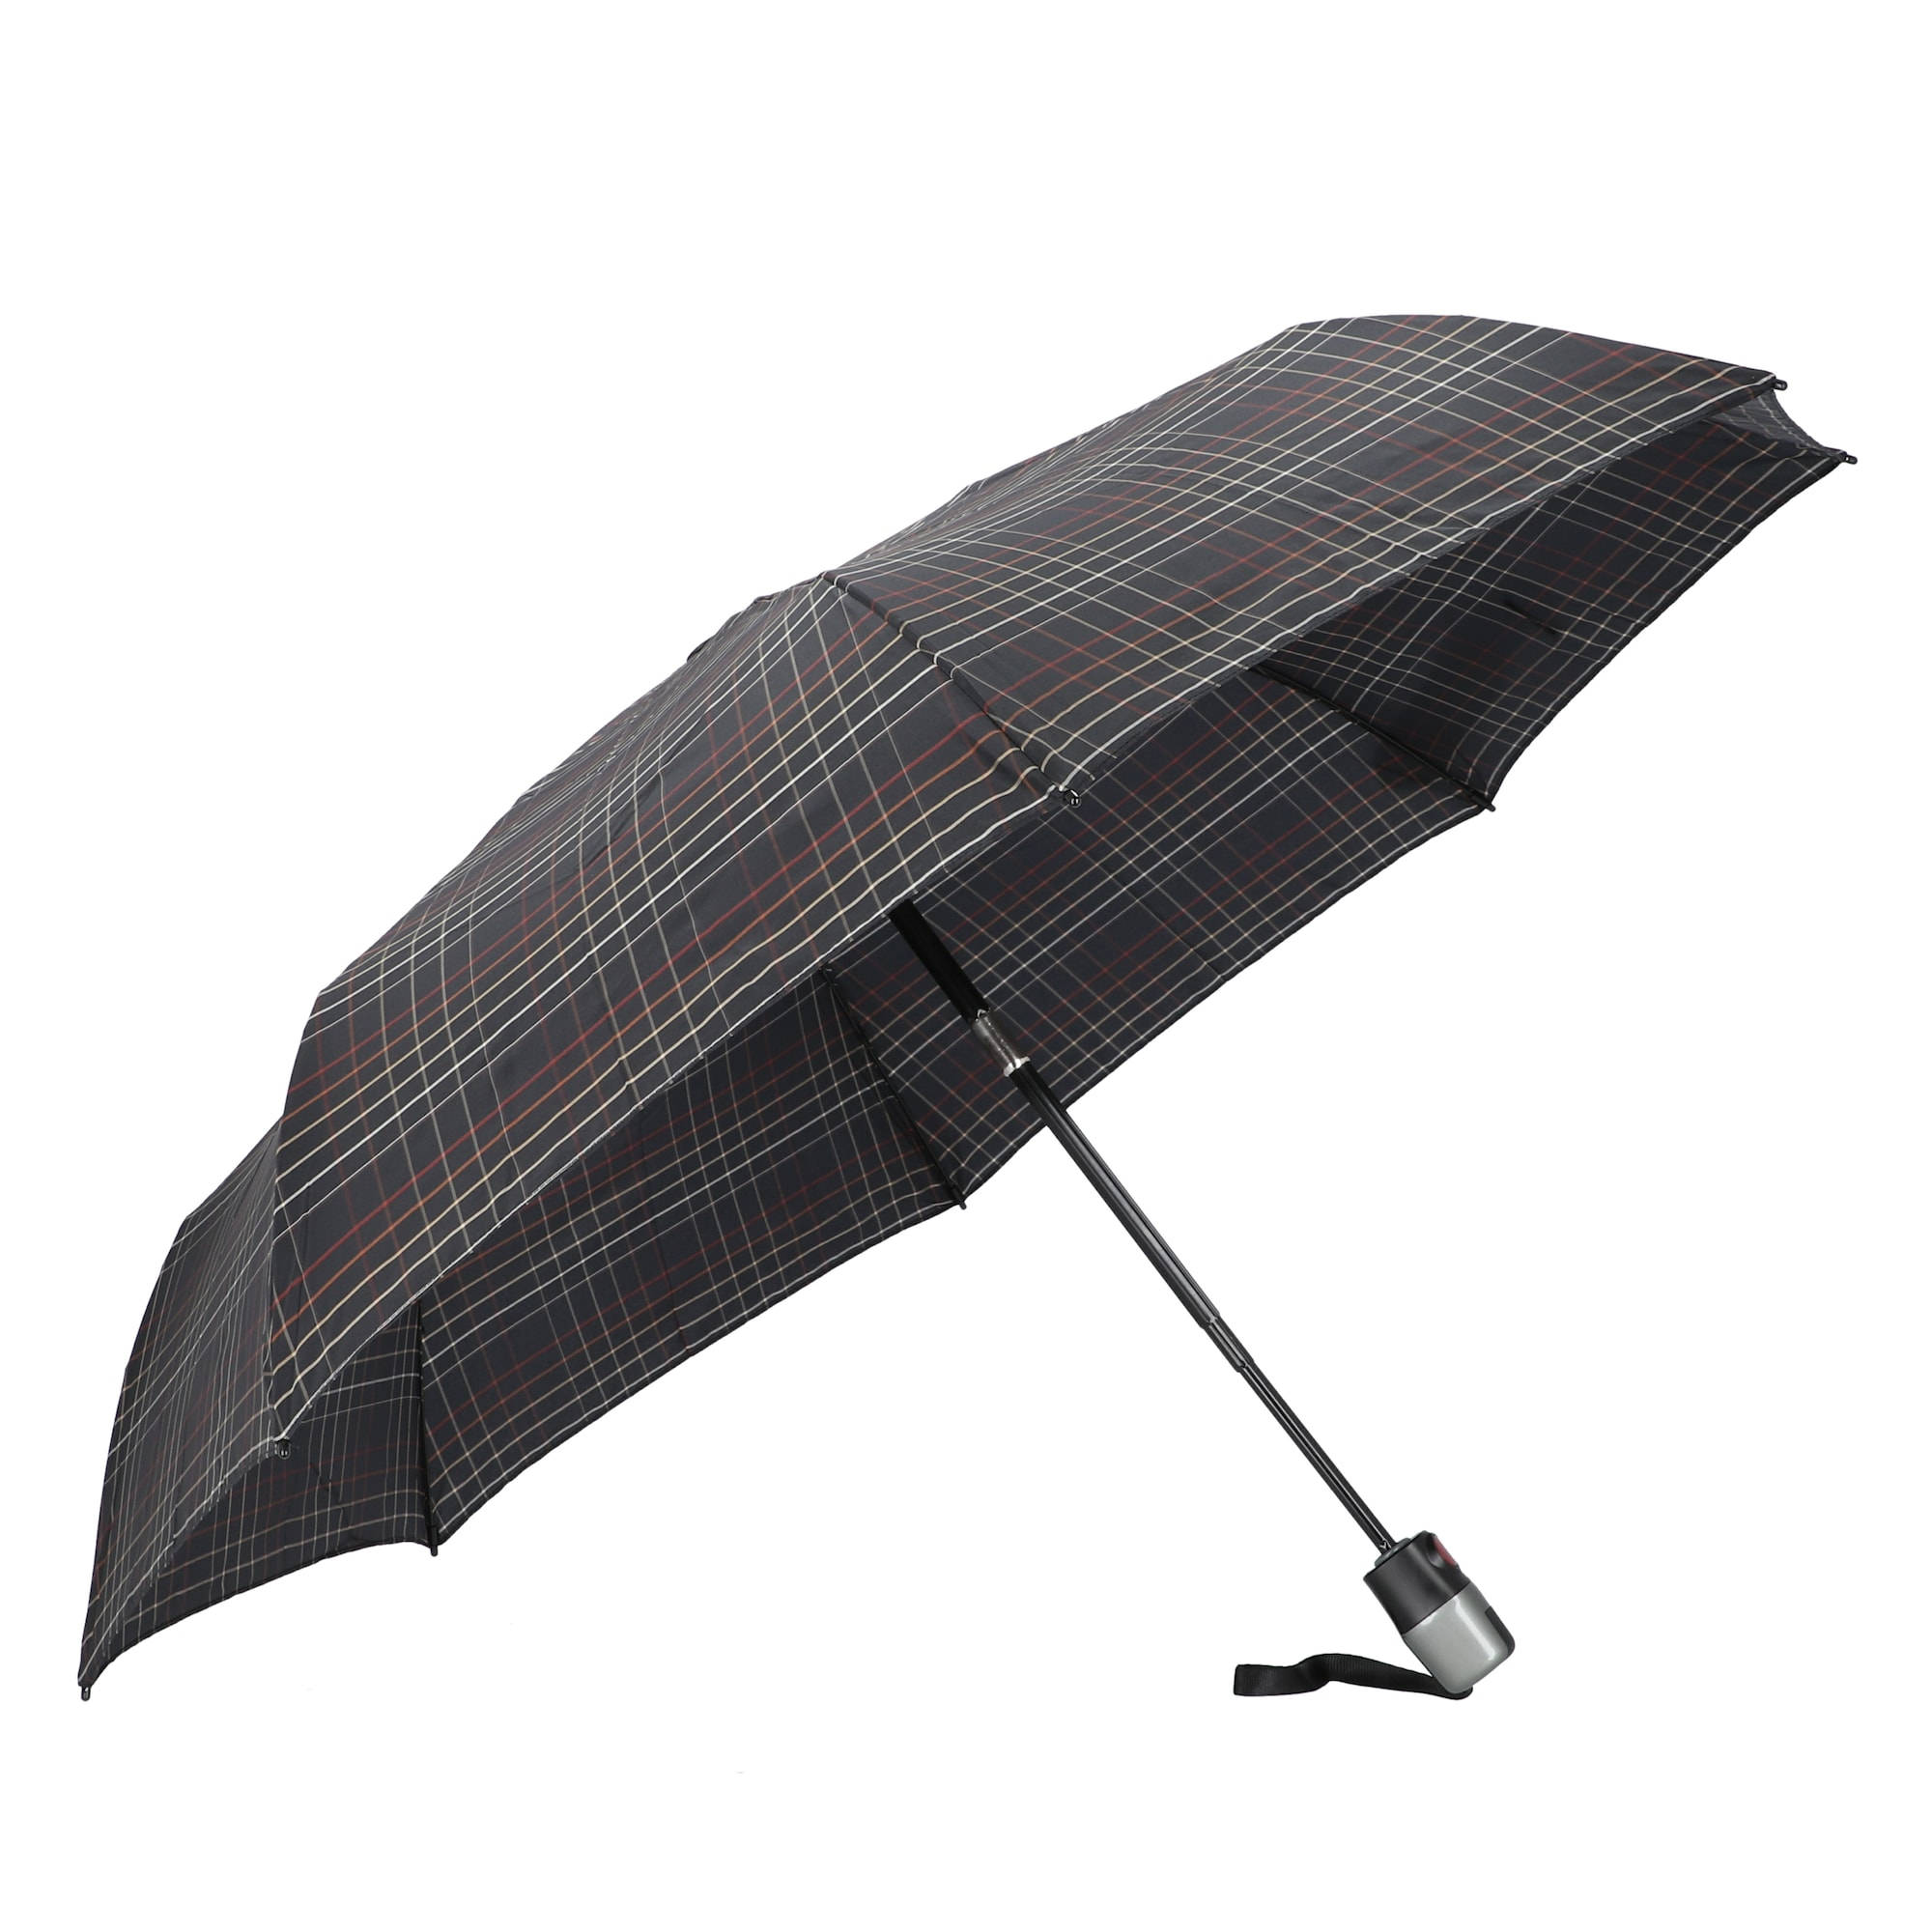 Taschenschirm 'T 301' | Accessoires > Regenschirme > Taschenschirme | knirps